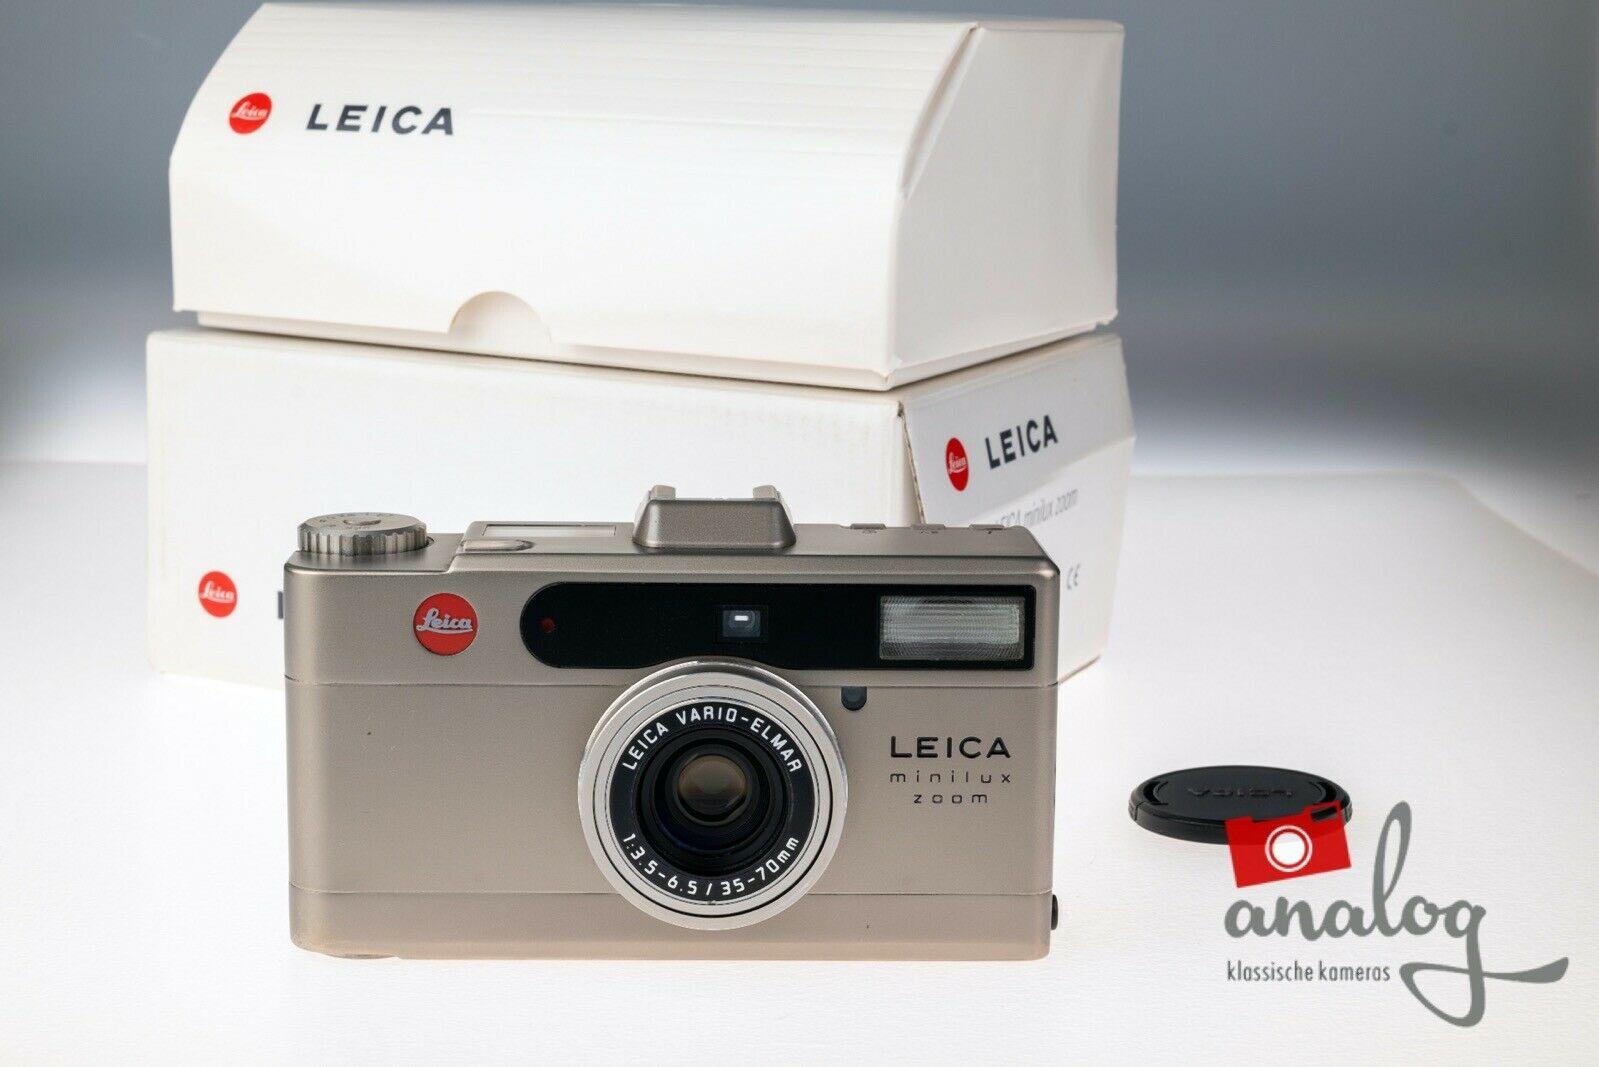 Leica Minilux Zoom - 18036